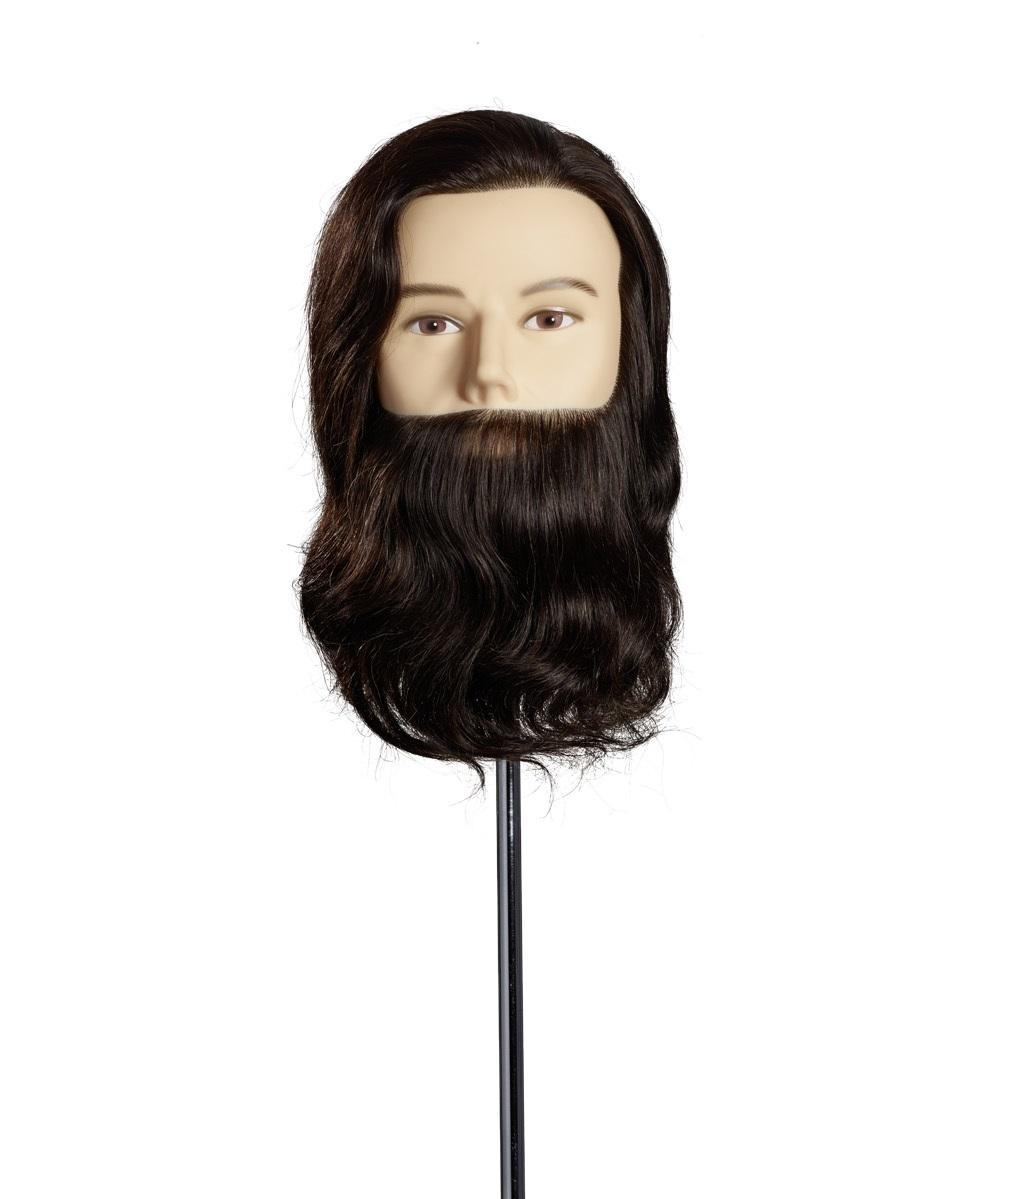 Cap Manechin cu Barba Max, 25cm, Par Natural, Maro